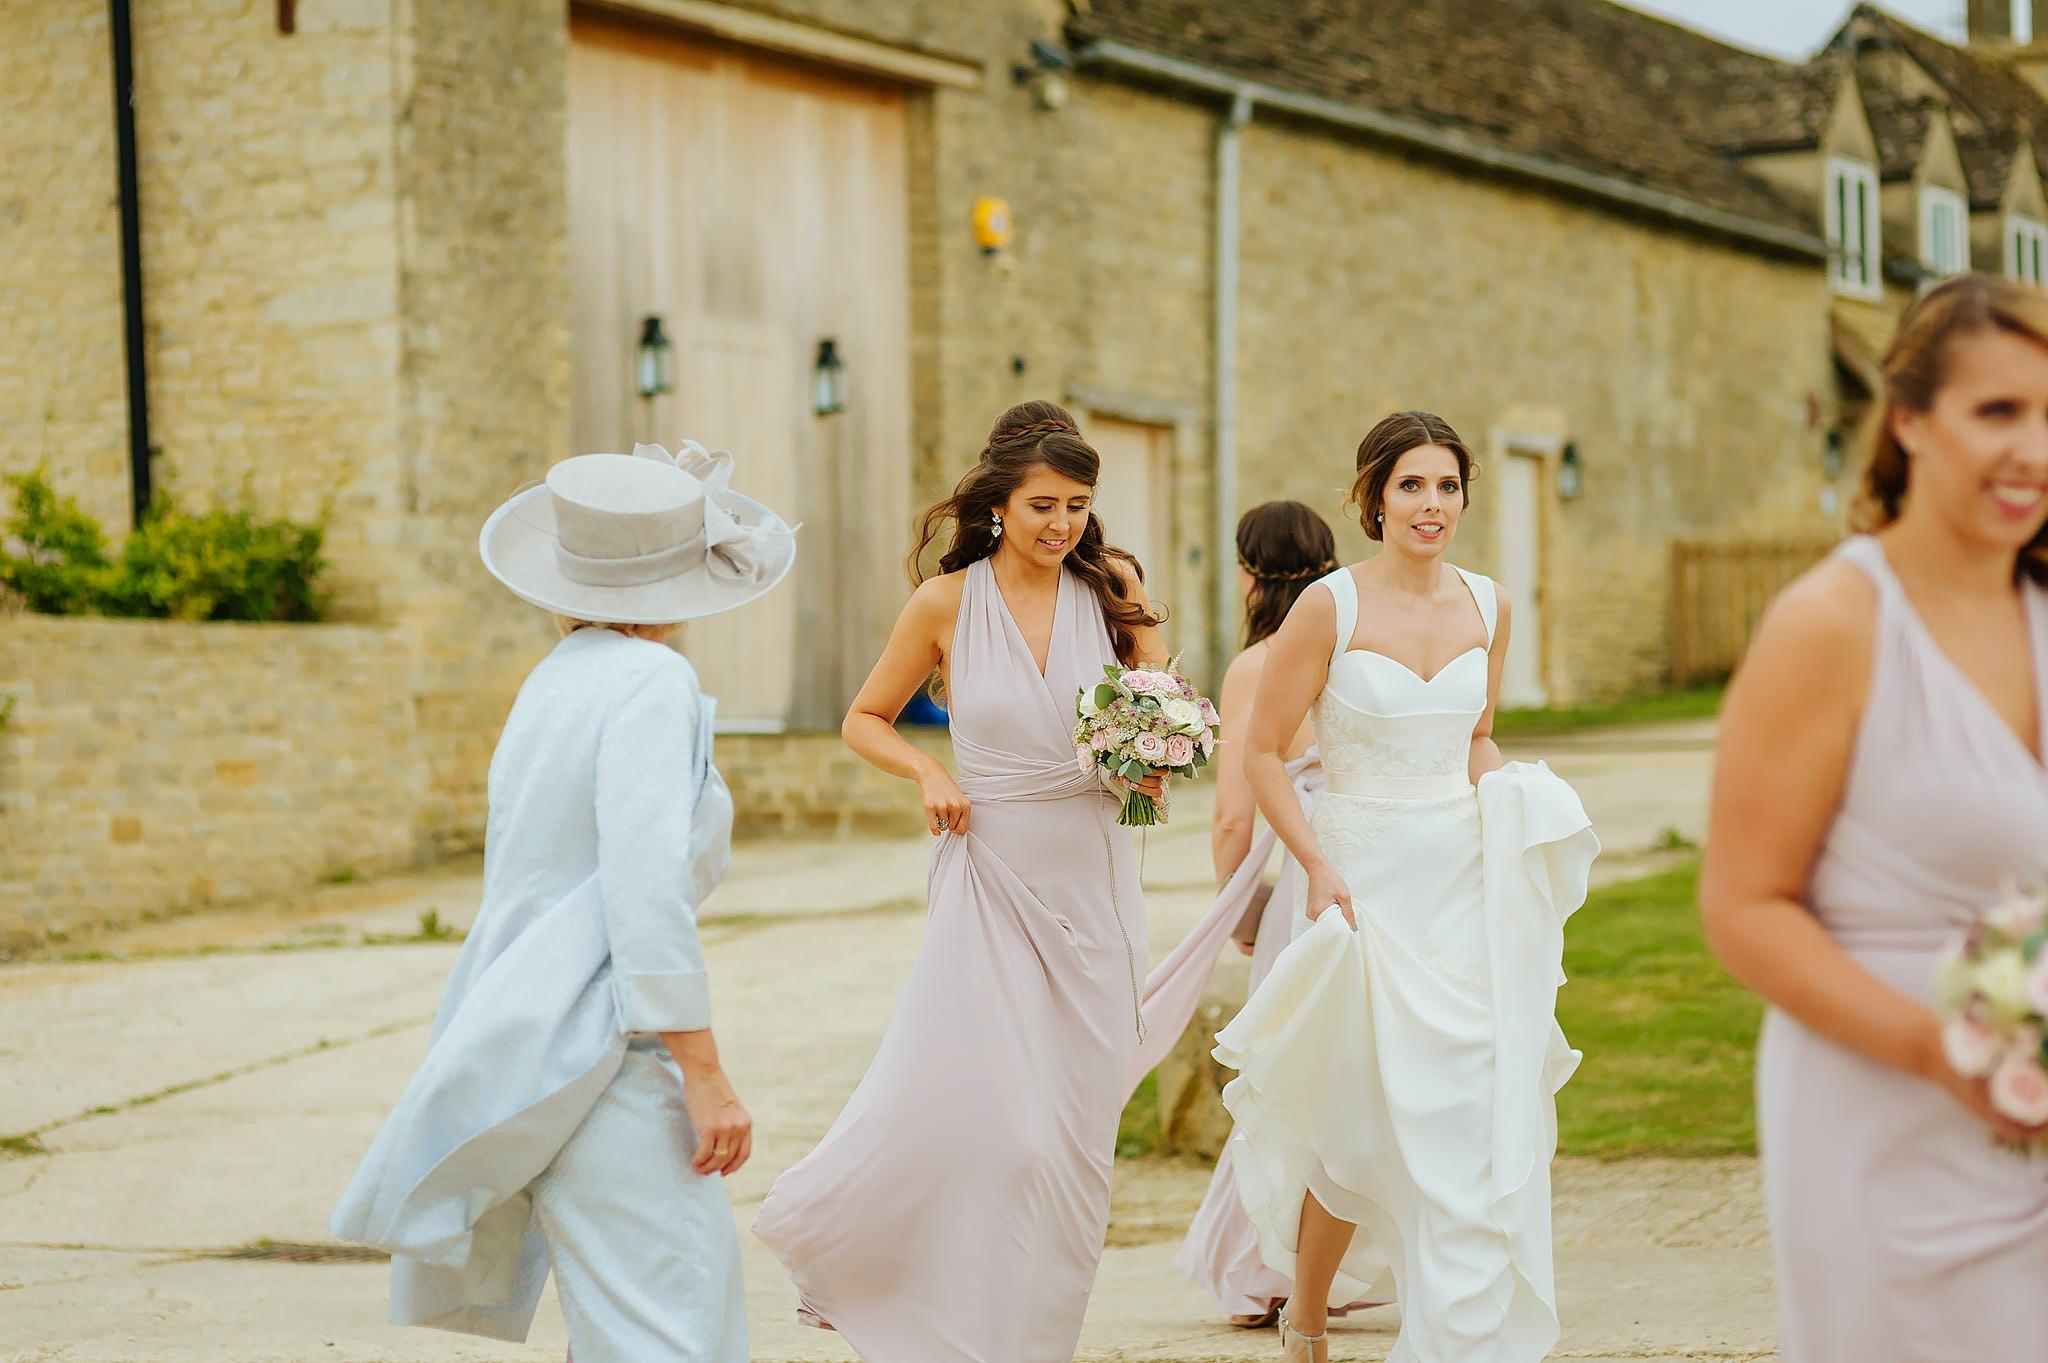 stone-barn-wedding-cotswolds (29)